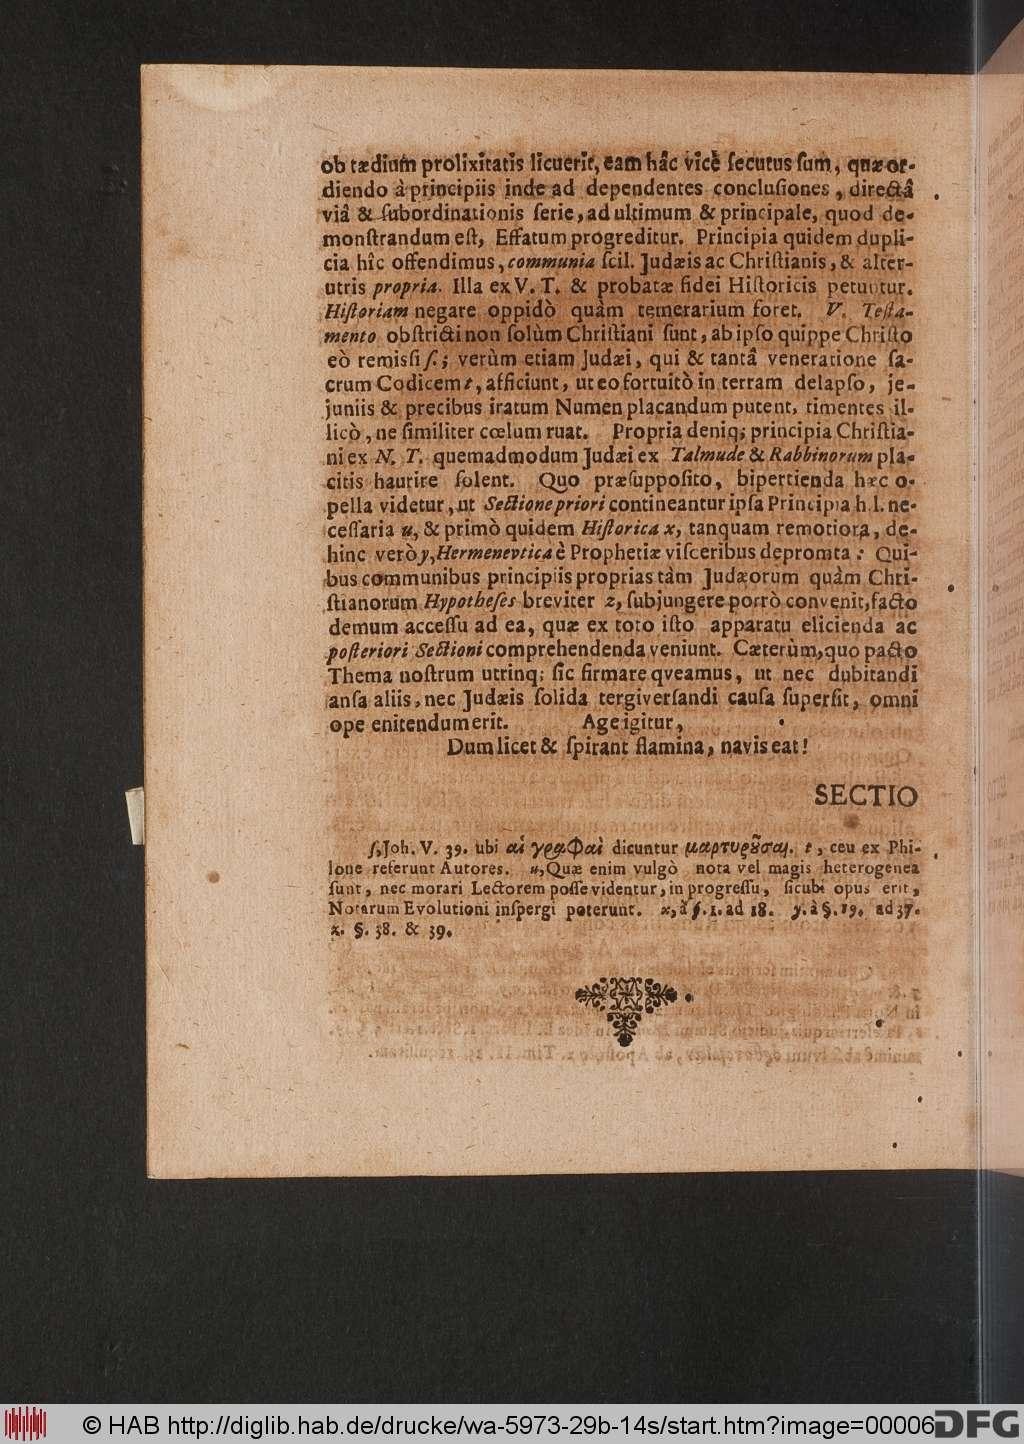 http://diglib.hab.de/drucke/wa-5973-29b-14s/00006.jpg